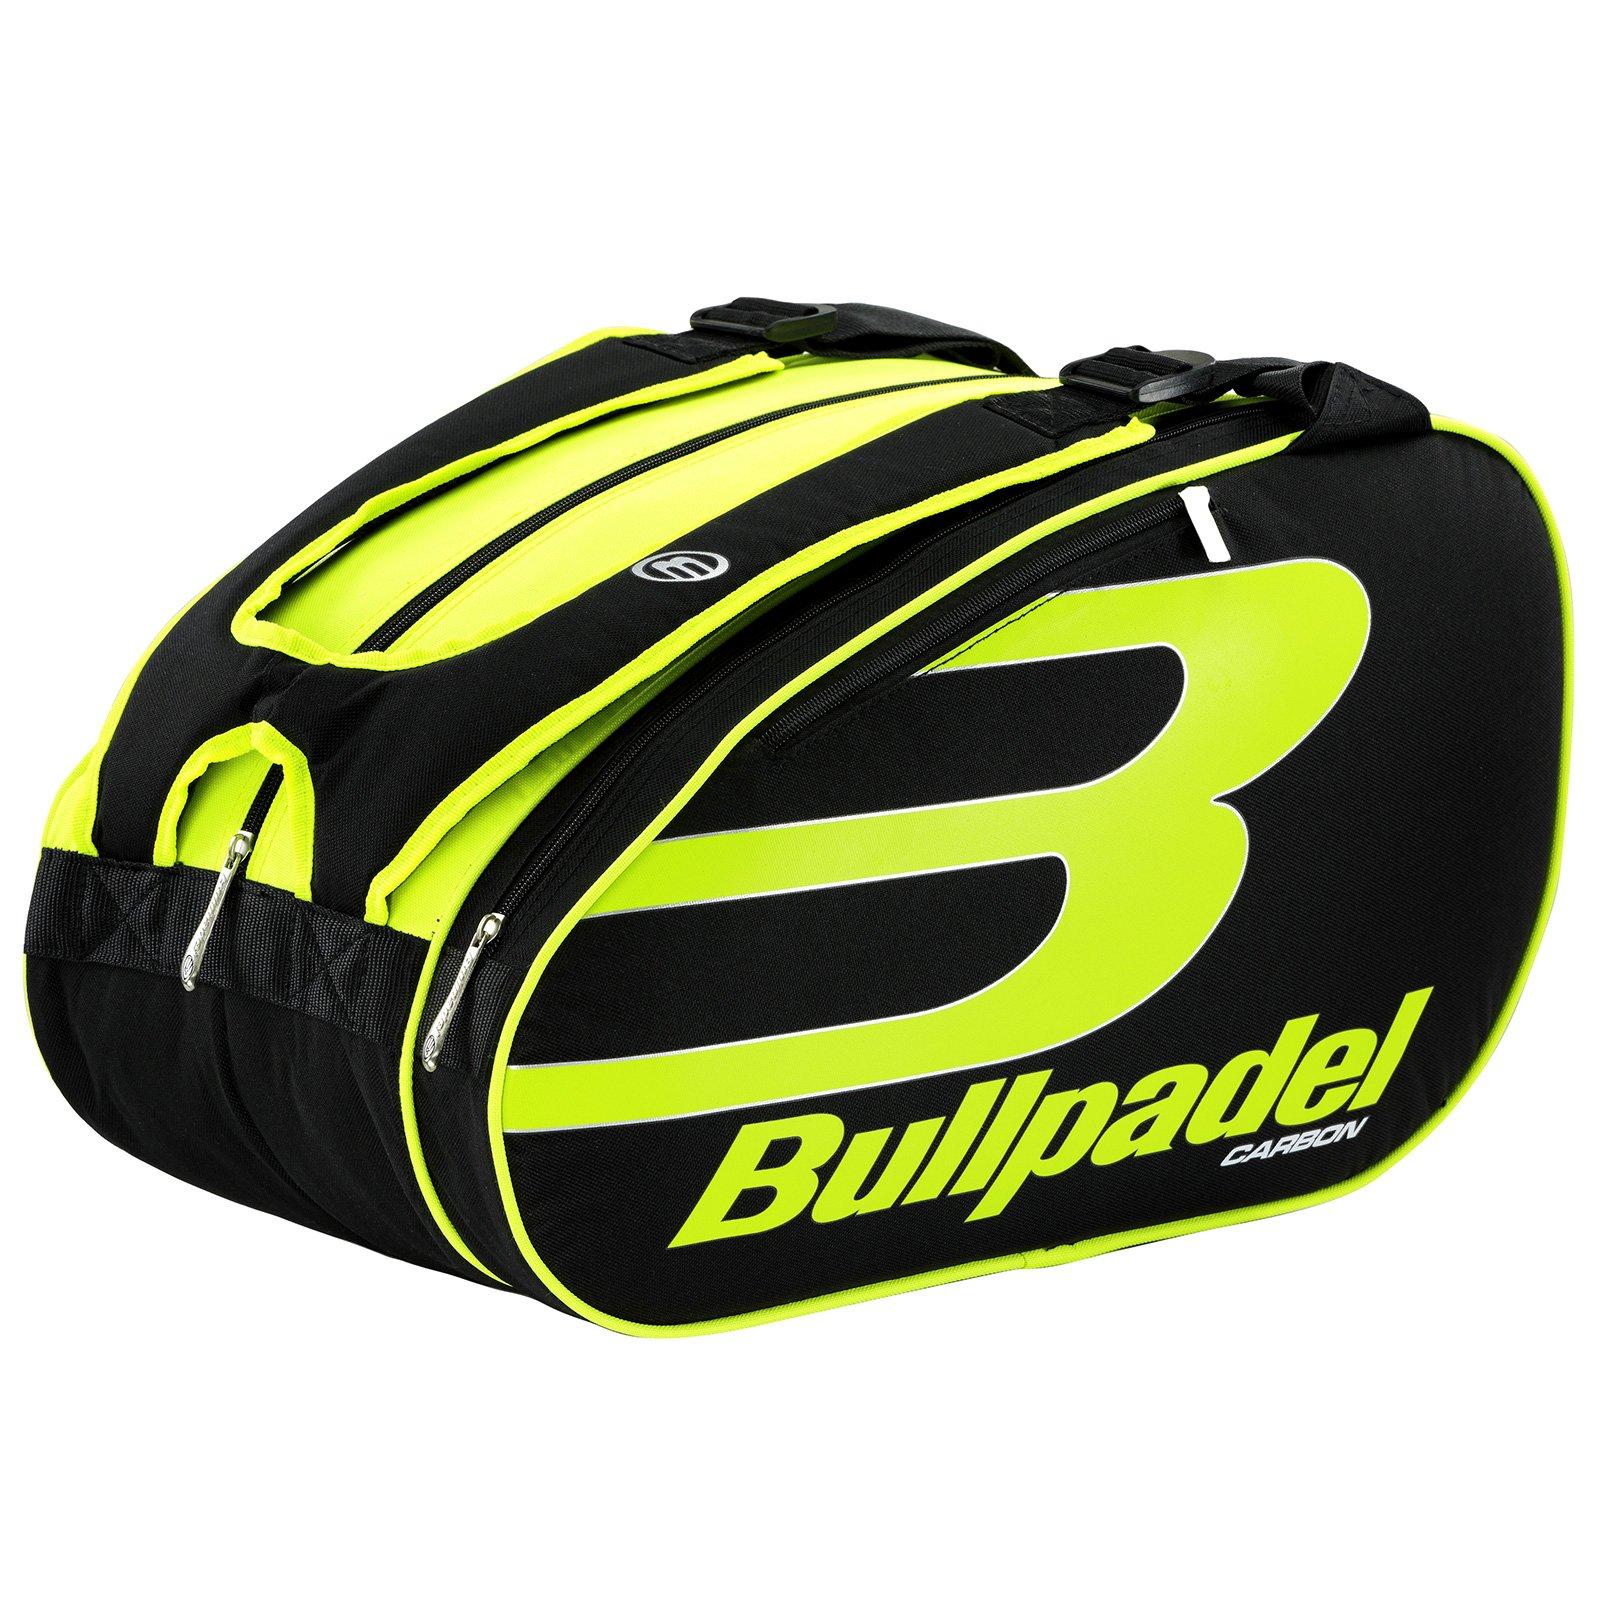 Paletero Bullpadel 17004 Yellow product image